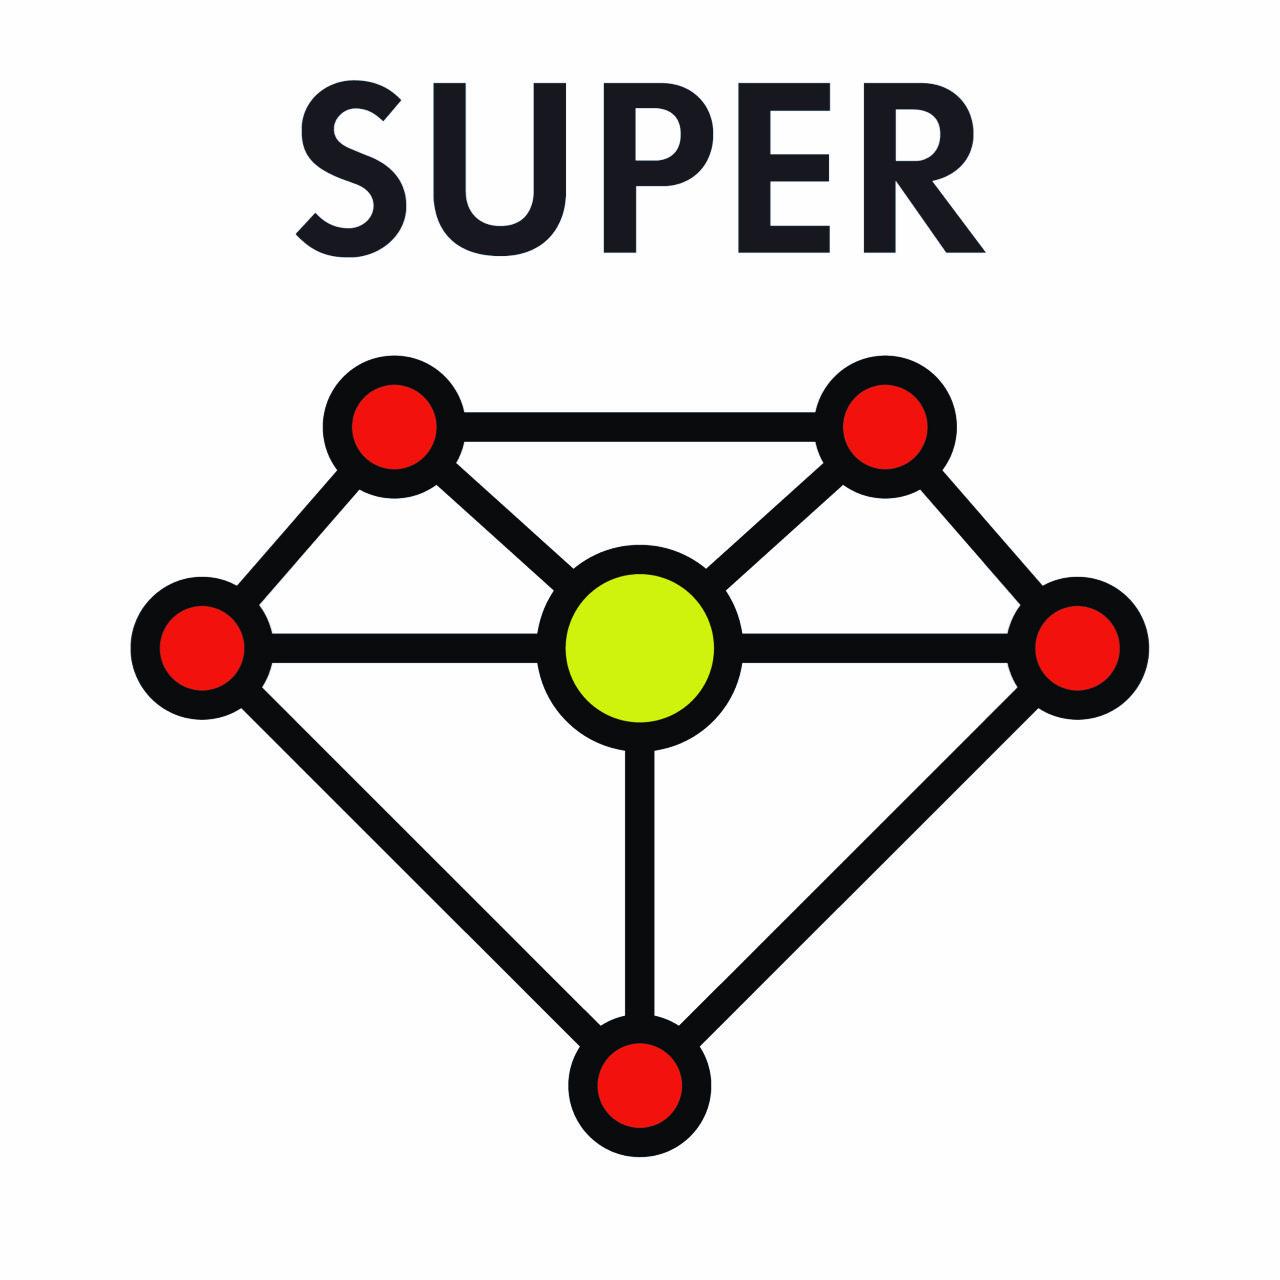 Super_logo-17.jpeg